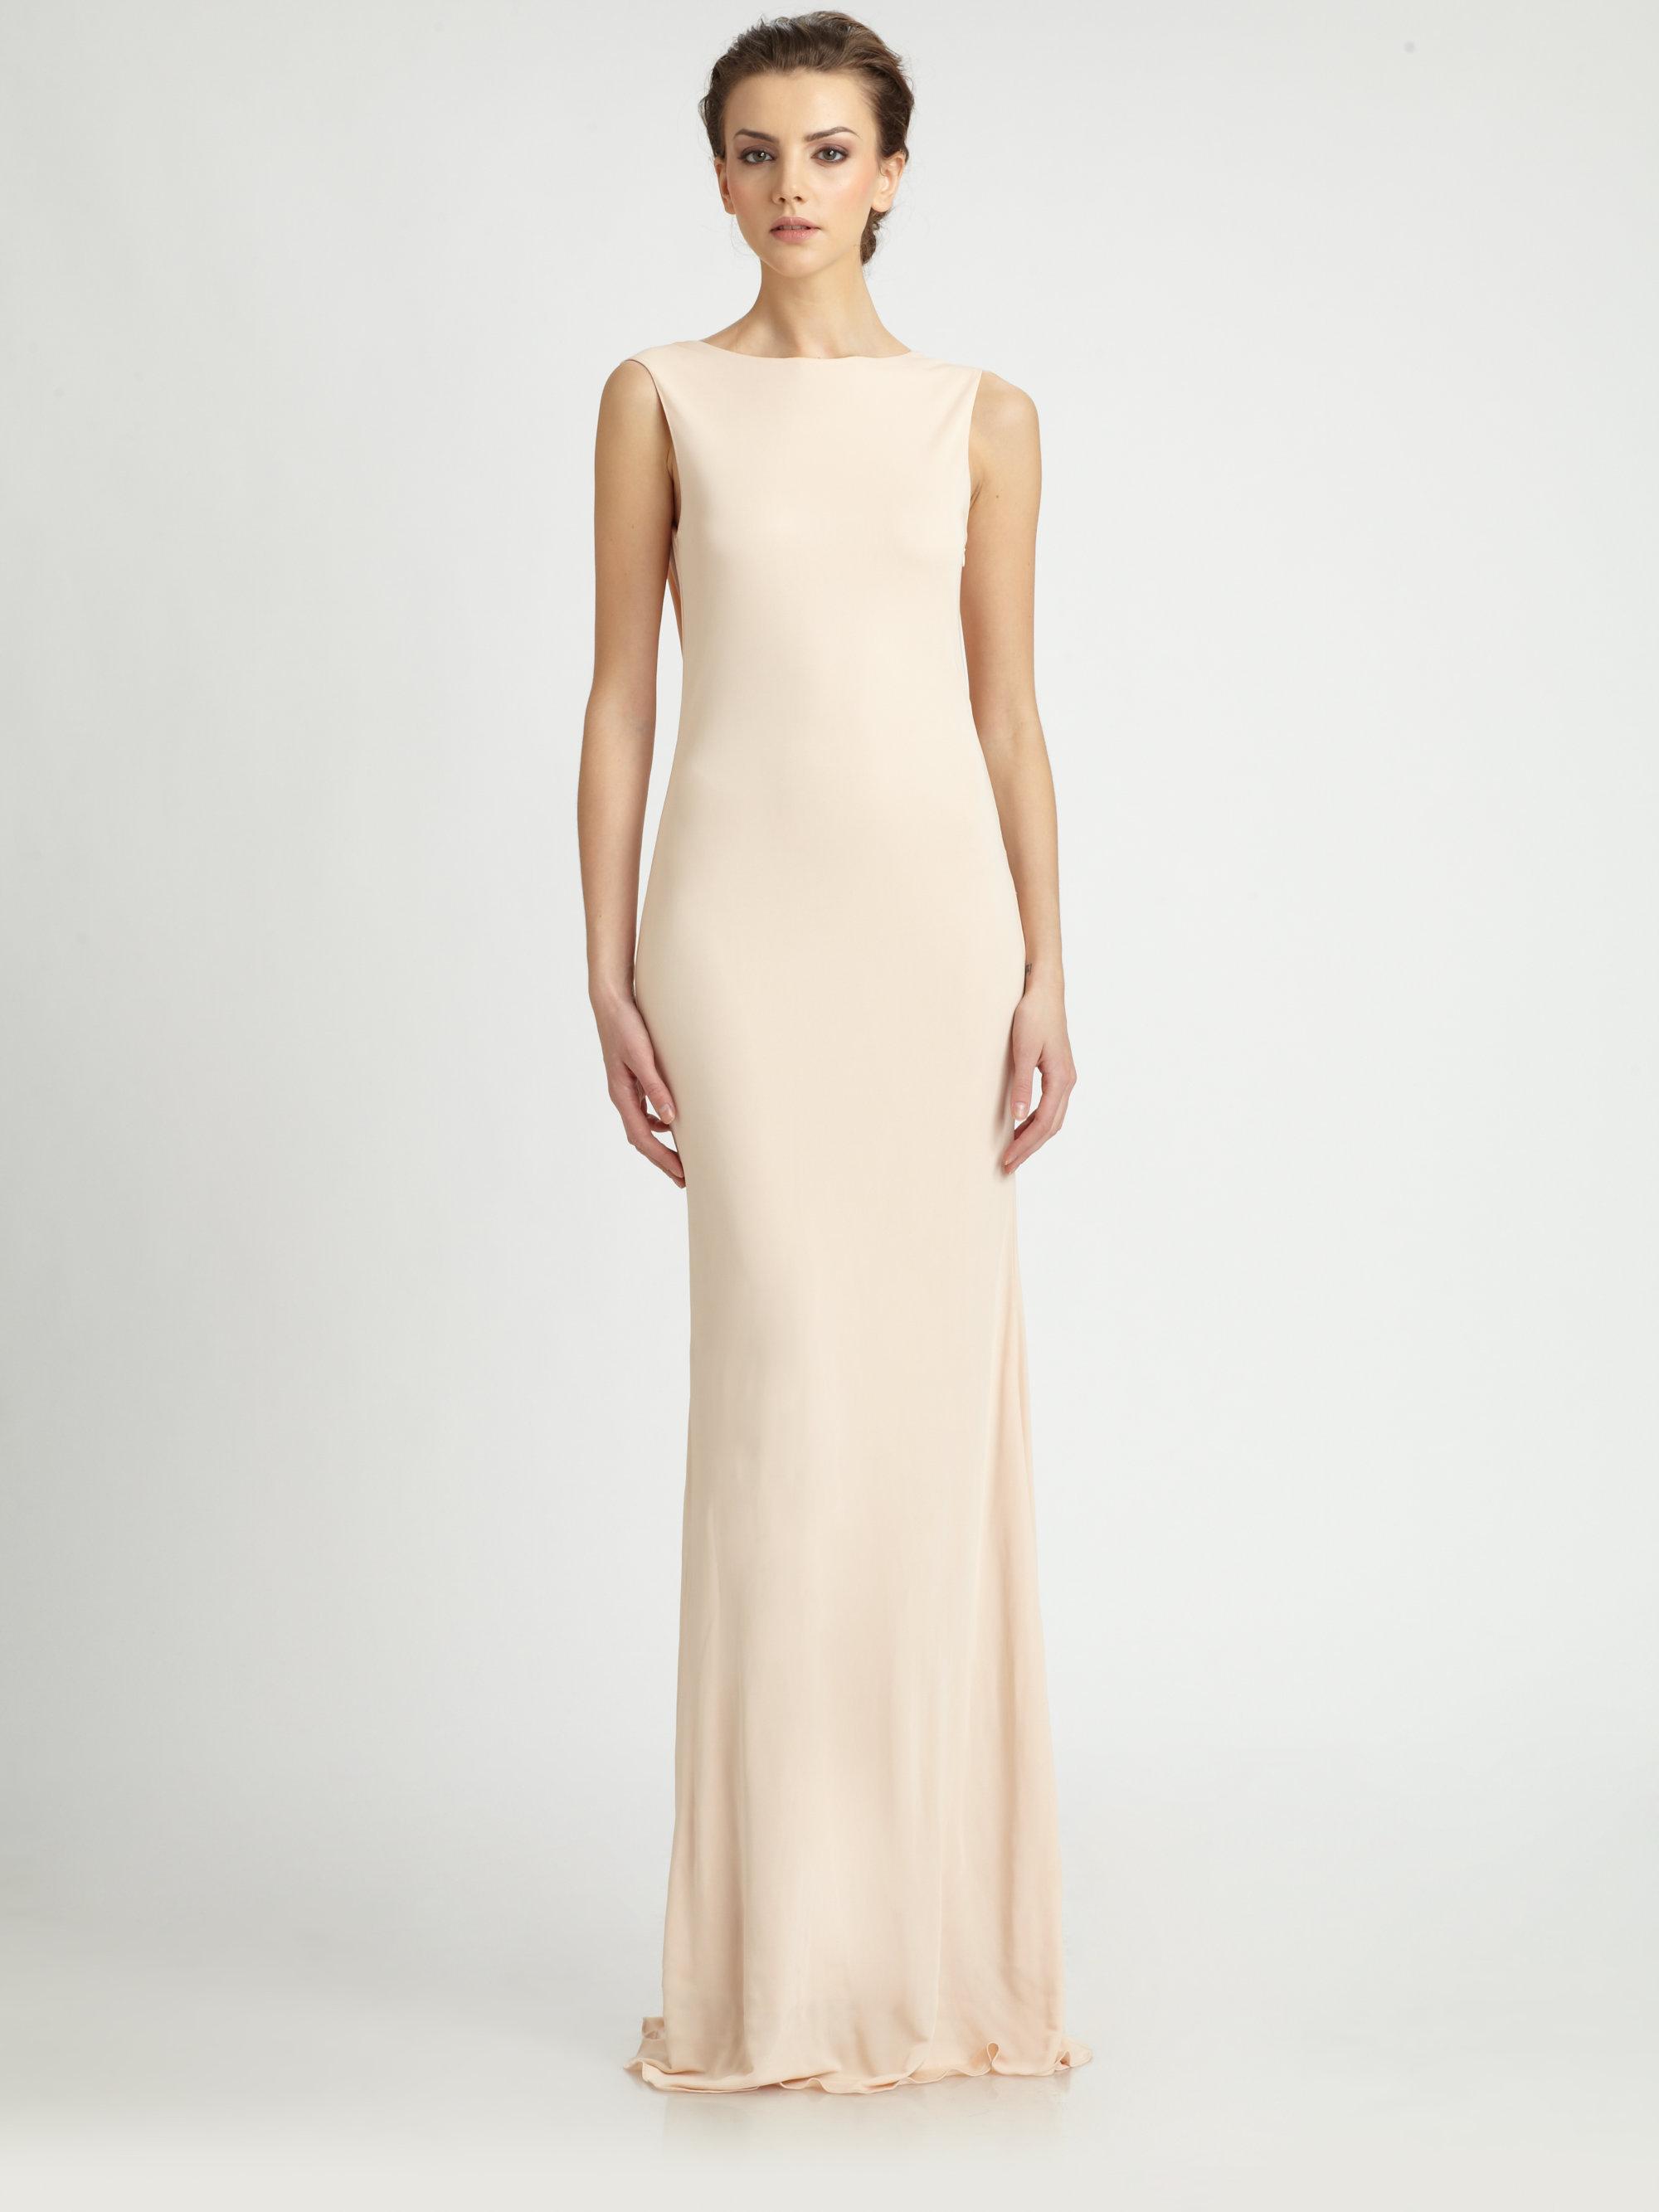 Xcite Prom 2014 Dresses – Fashion dresses